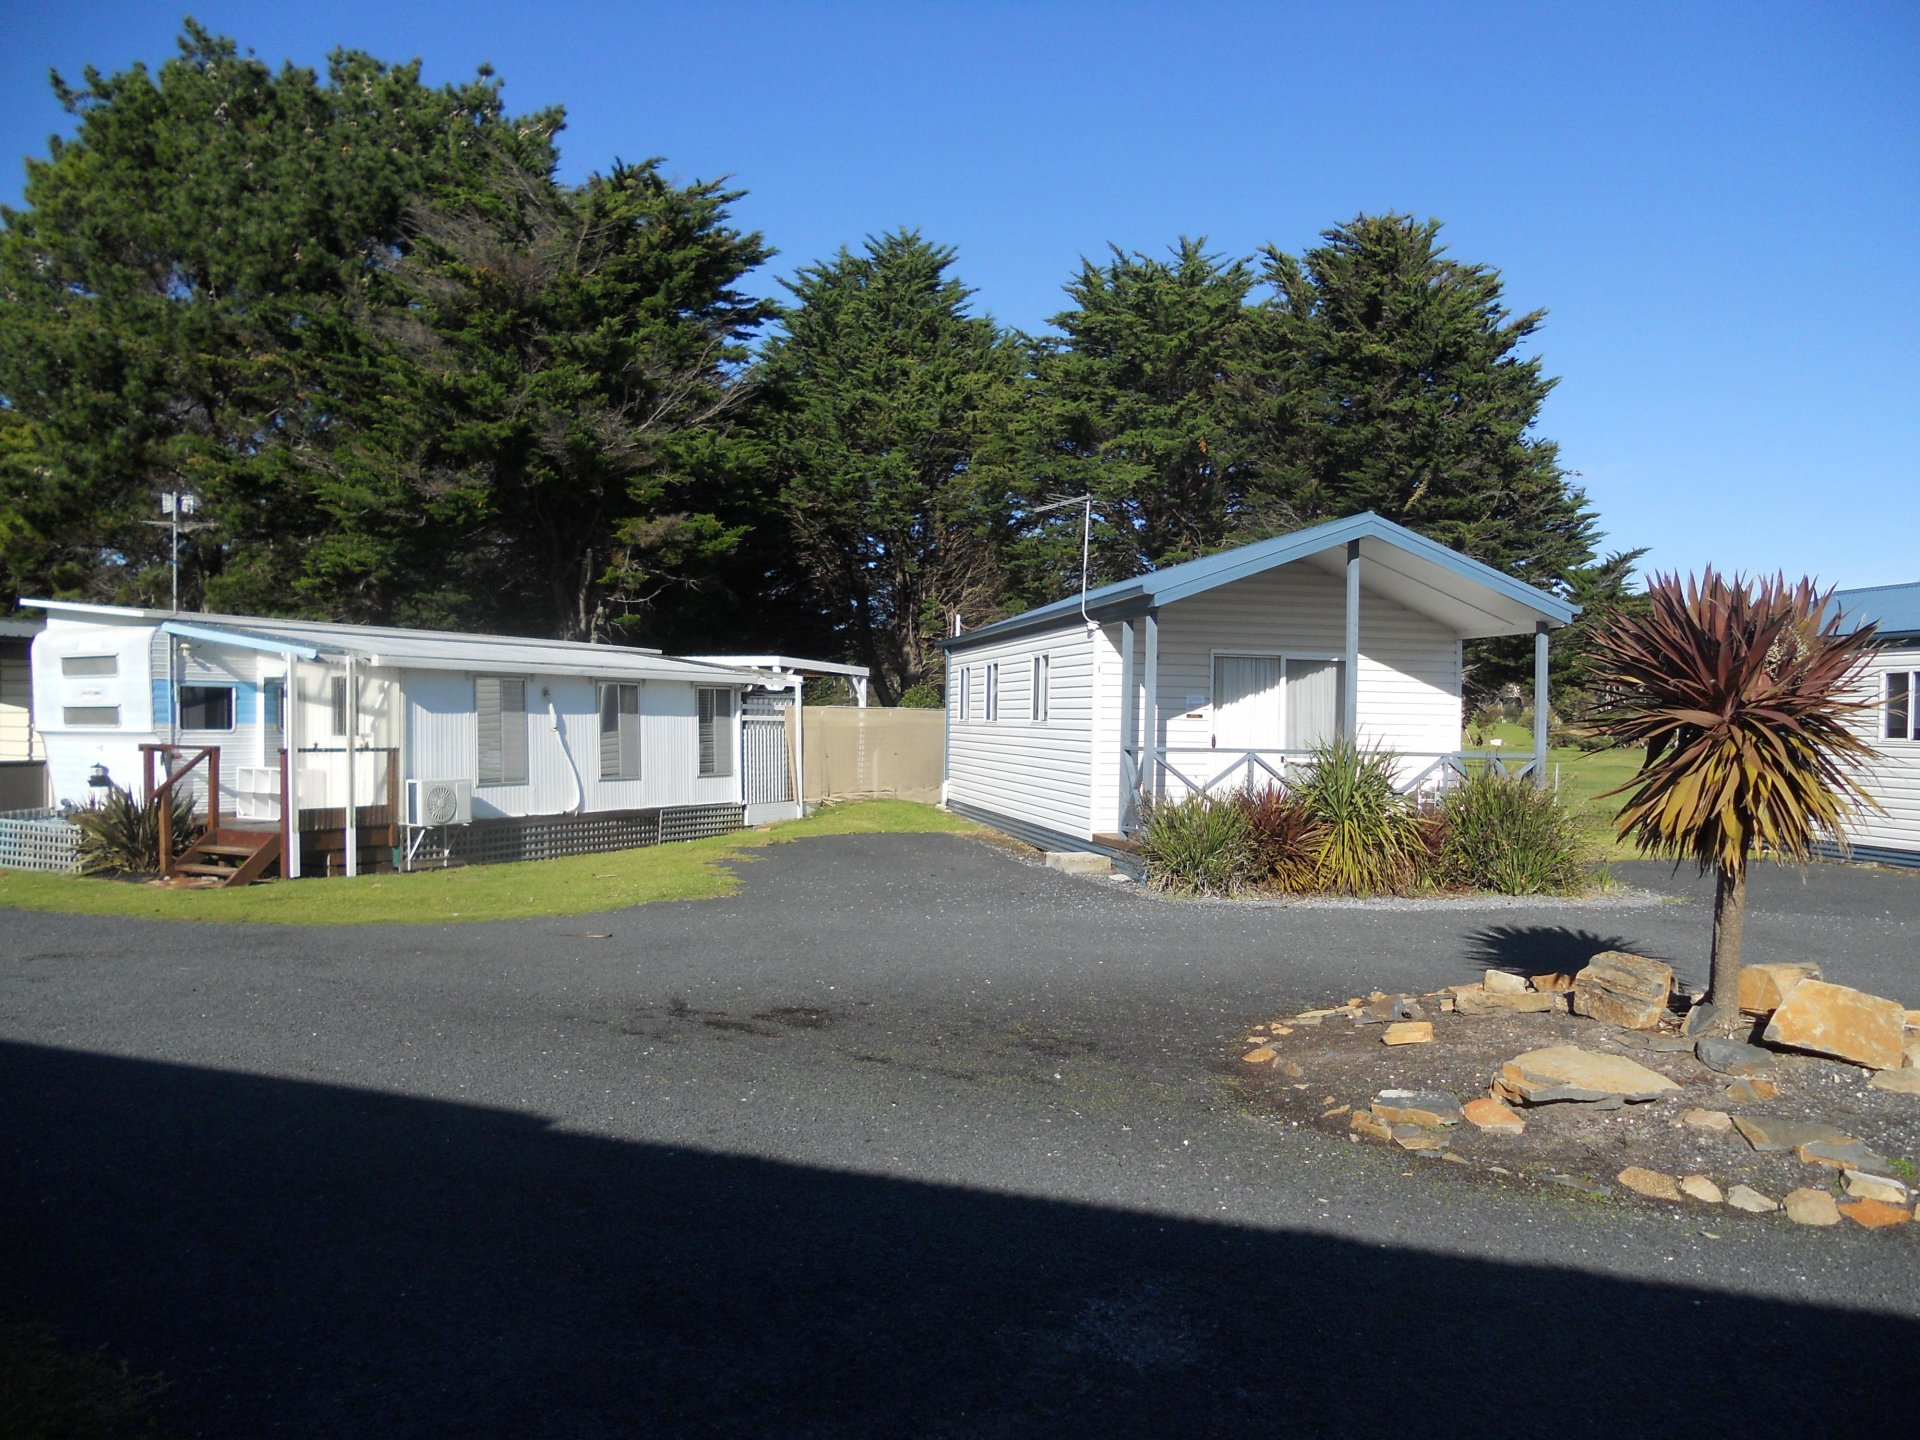 Best Value Tasmanian L/H Caravan Park O/O $550,000,4 f/hold cabins, average 2 yr